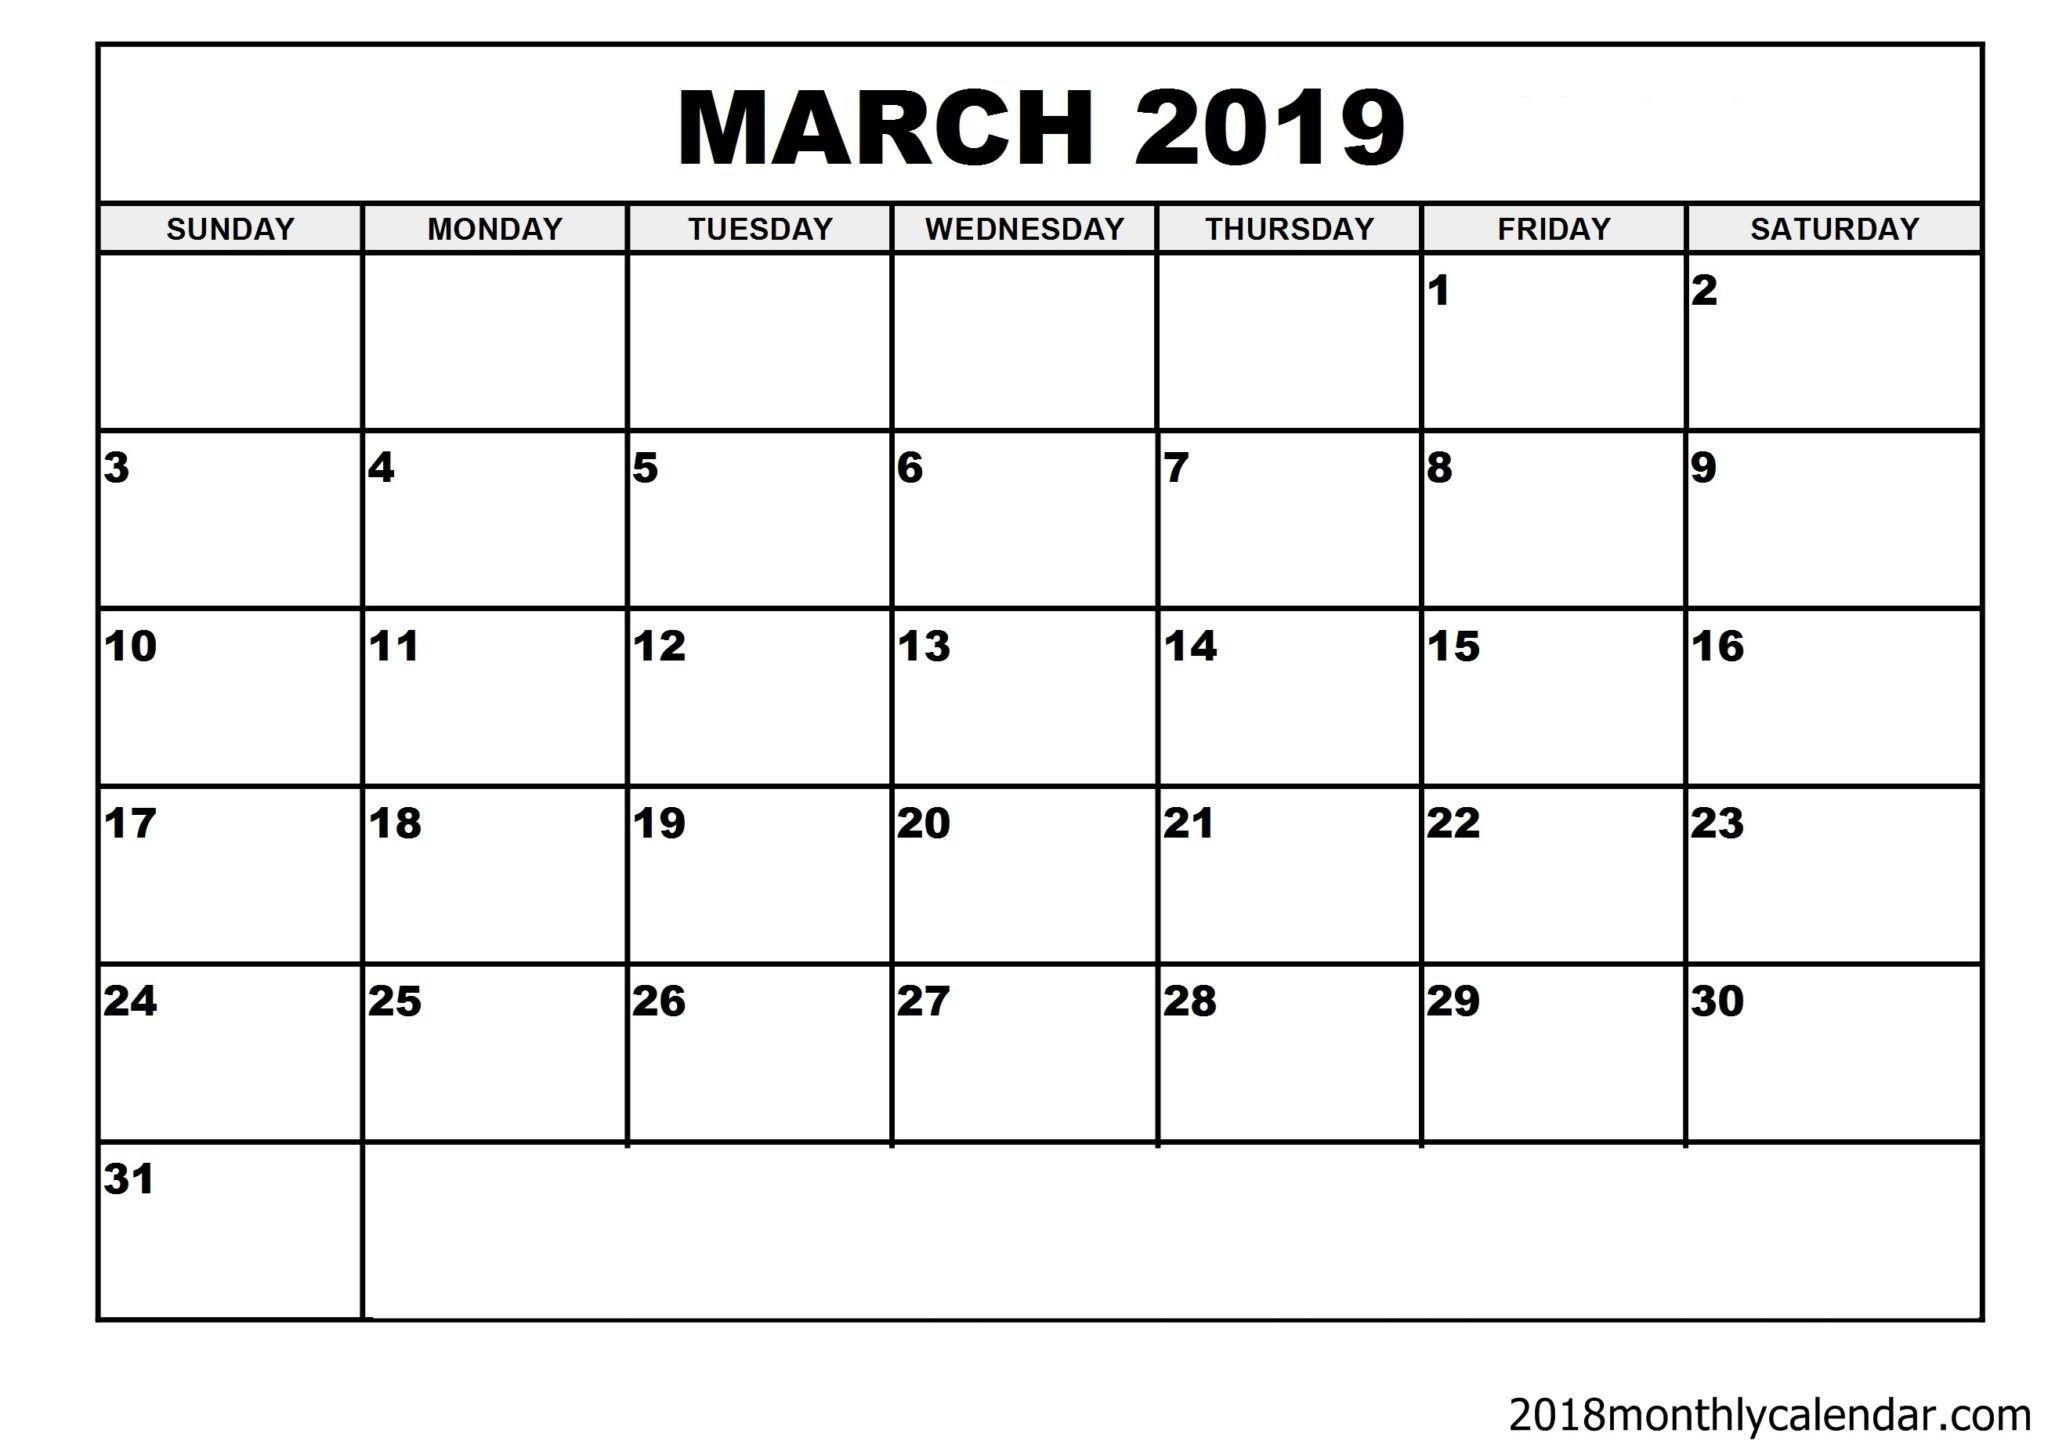 Download March 2019 Calendar – Blank Template – Editable Calendar Calendar 2019 Vertex